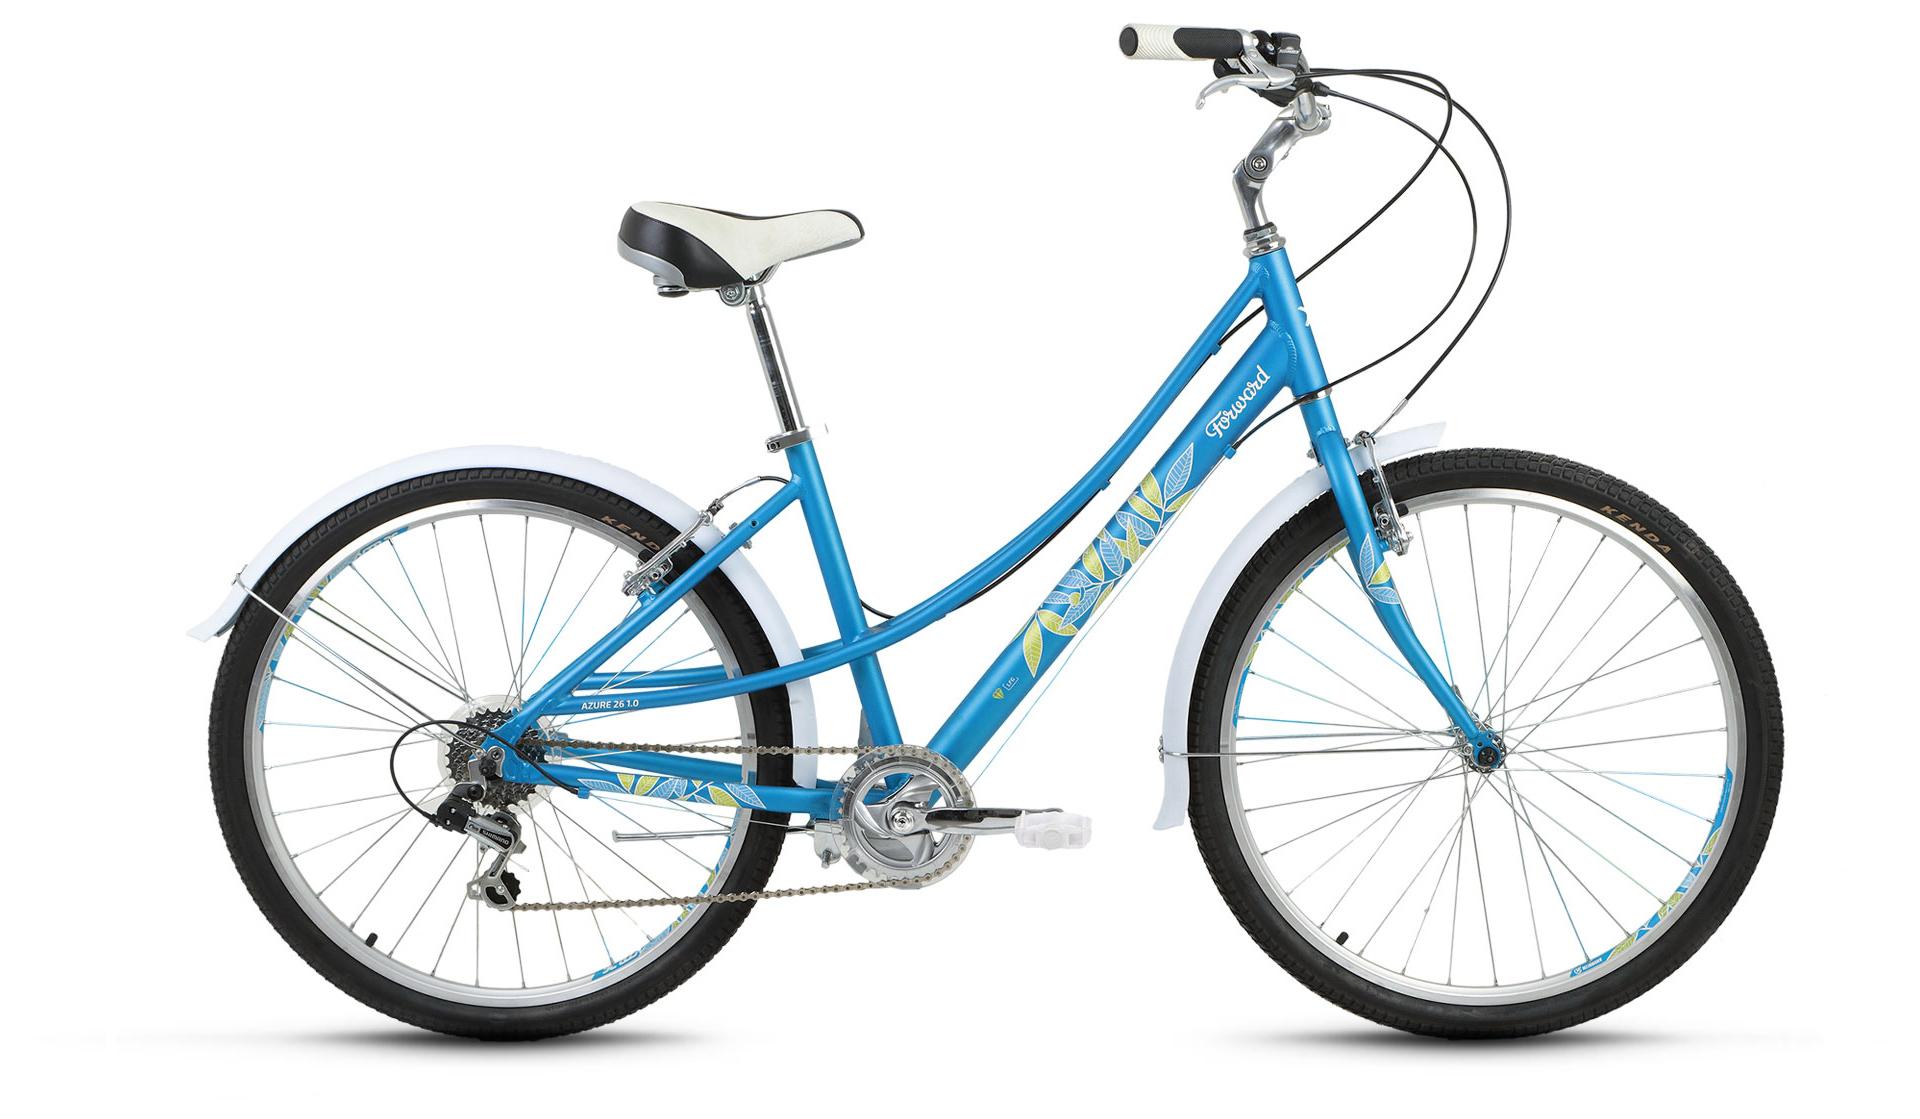 Велосипед Forward Azure 26 1.0 2019 велосипед forward azure 1 0 2014